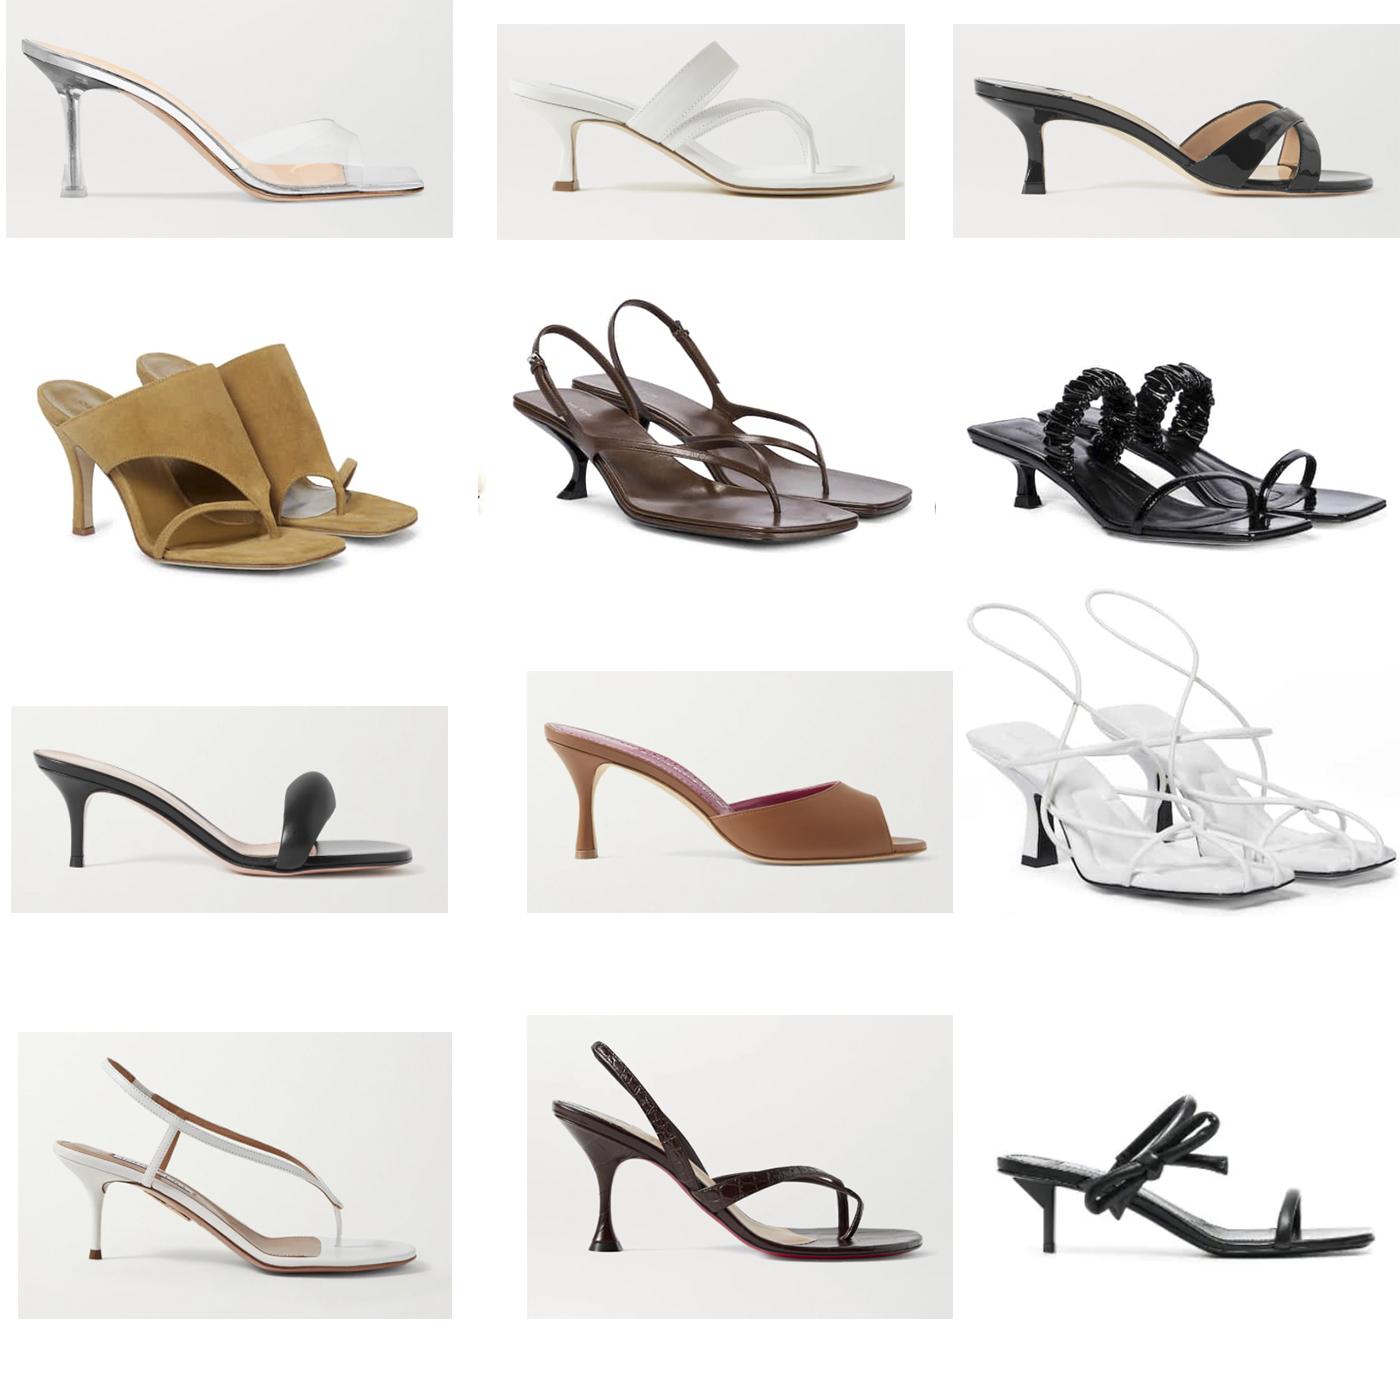 Trini |summer shoes edit